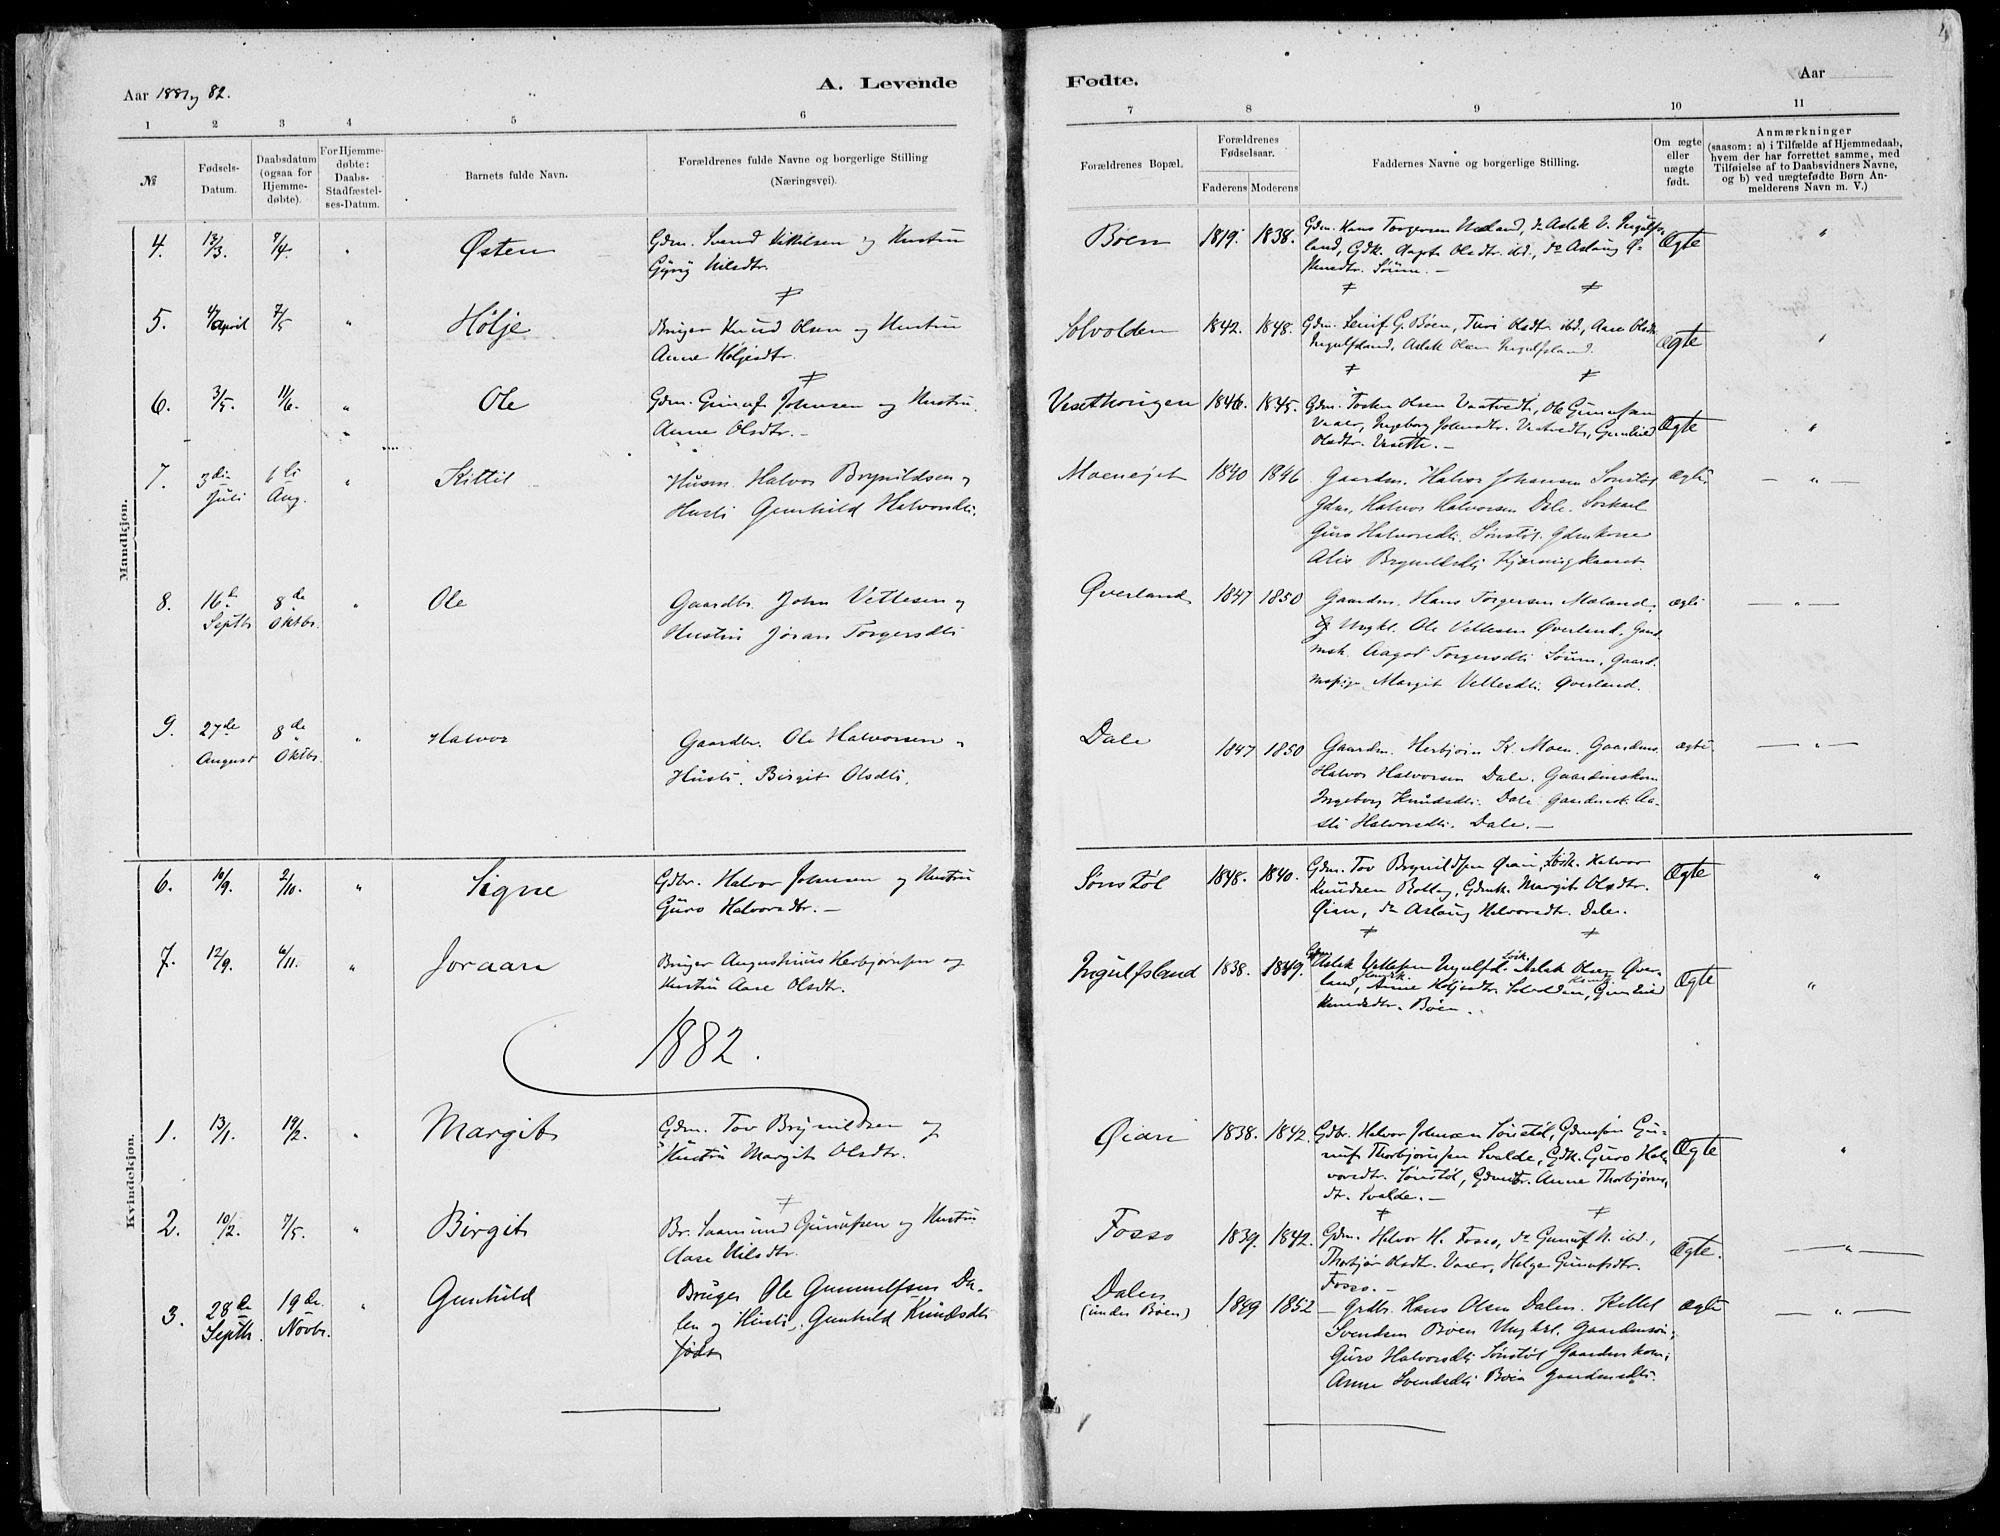 SAKO, Rjukan kirkebøker, F/Fa/L0001: Ministerialbok nr. 1, 1878-1912, s. 4